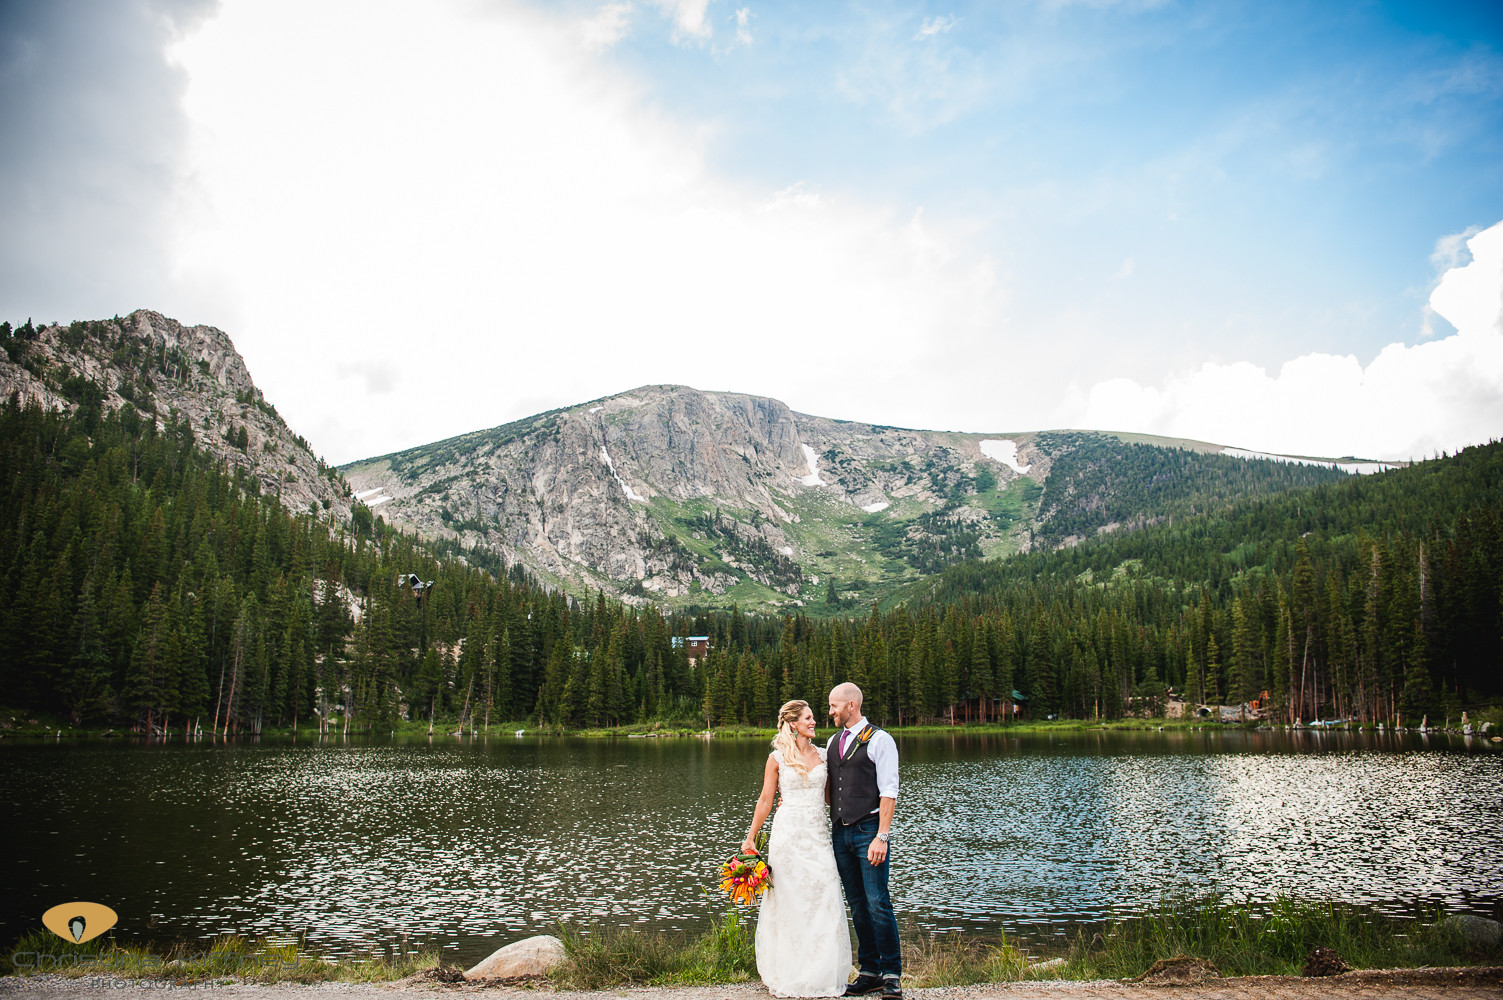 ckp-Colorado-Family-Elopement-0083.jpg